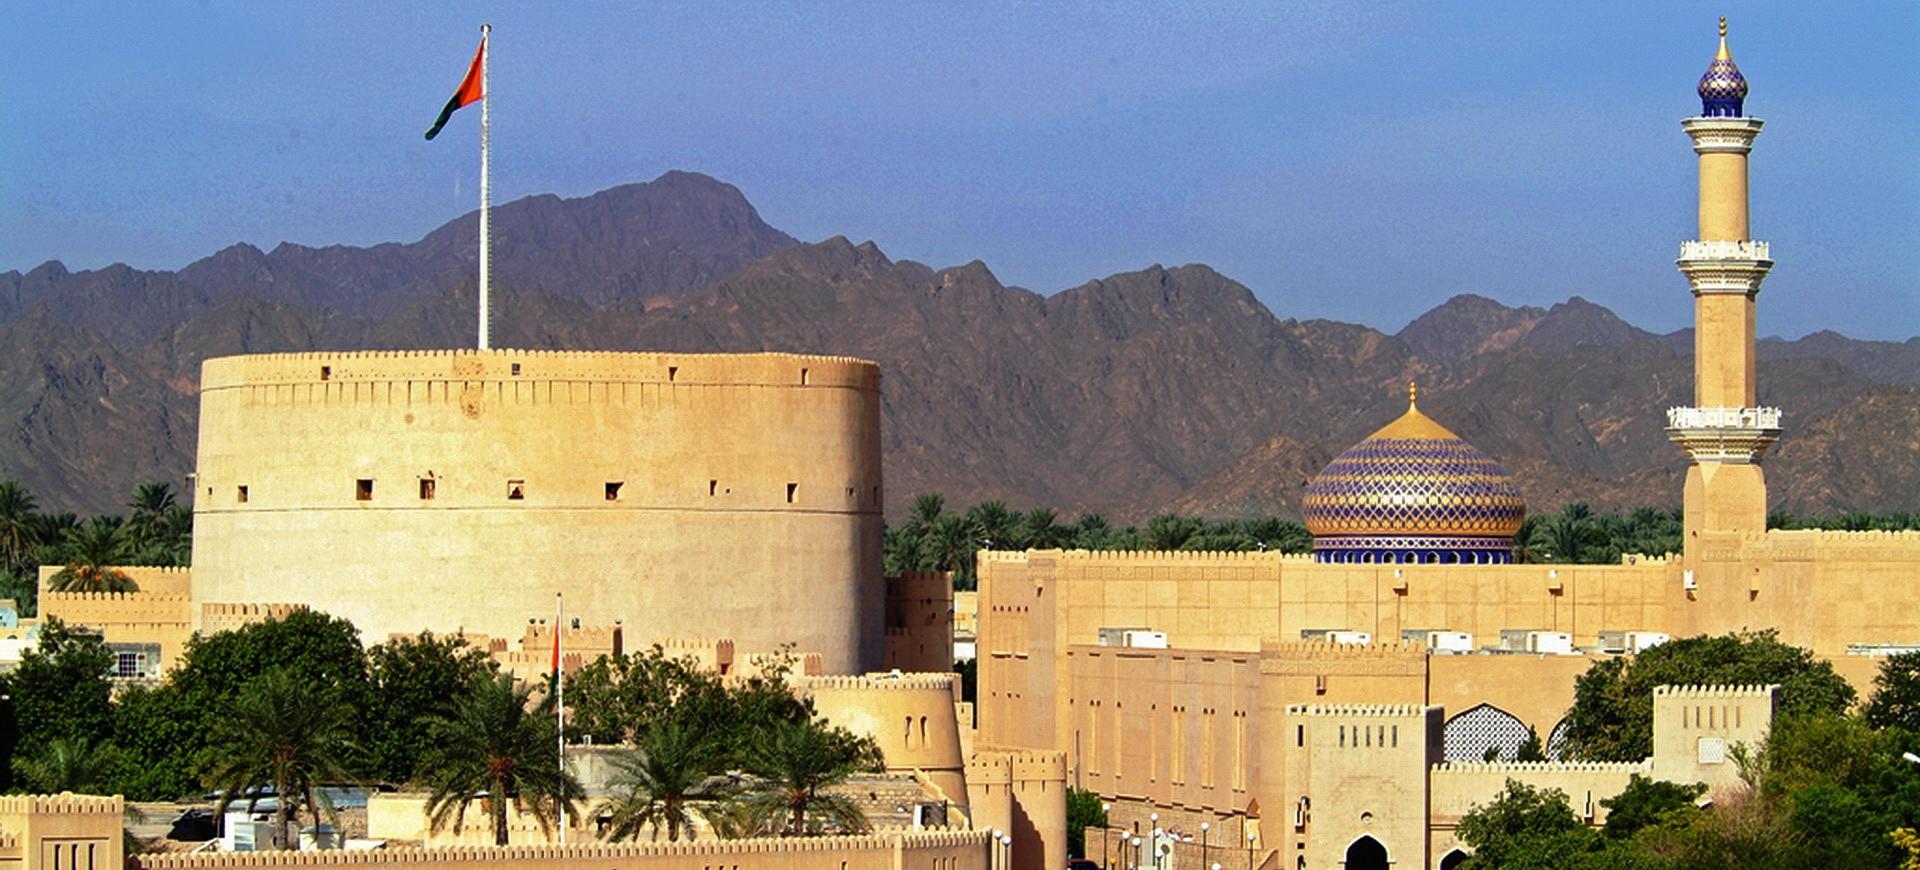 Oman Nizwa Fort et Mosquée Sultan Qaboos